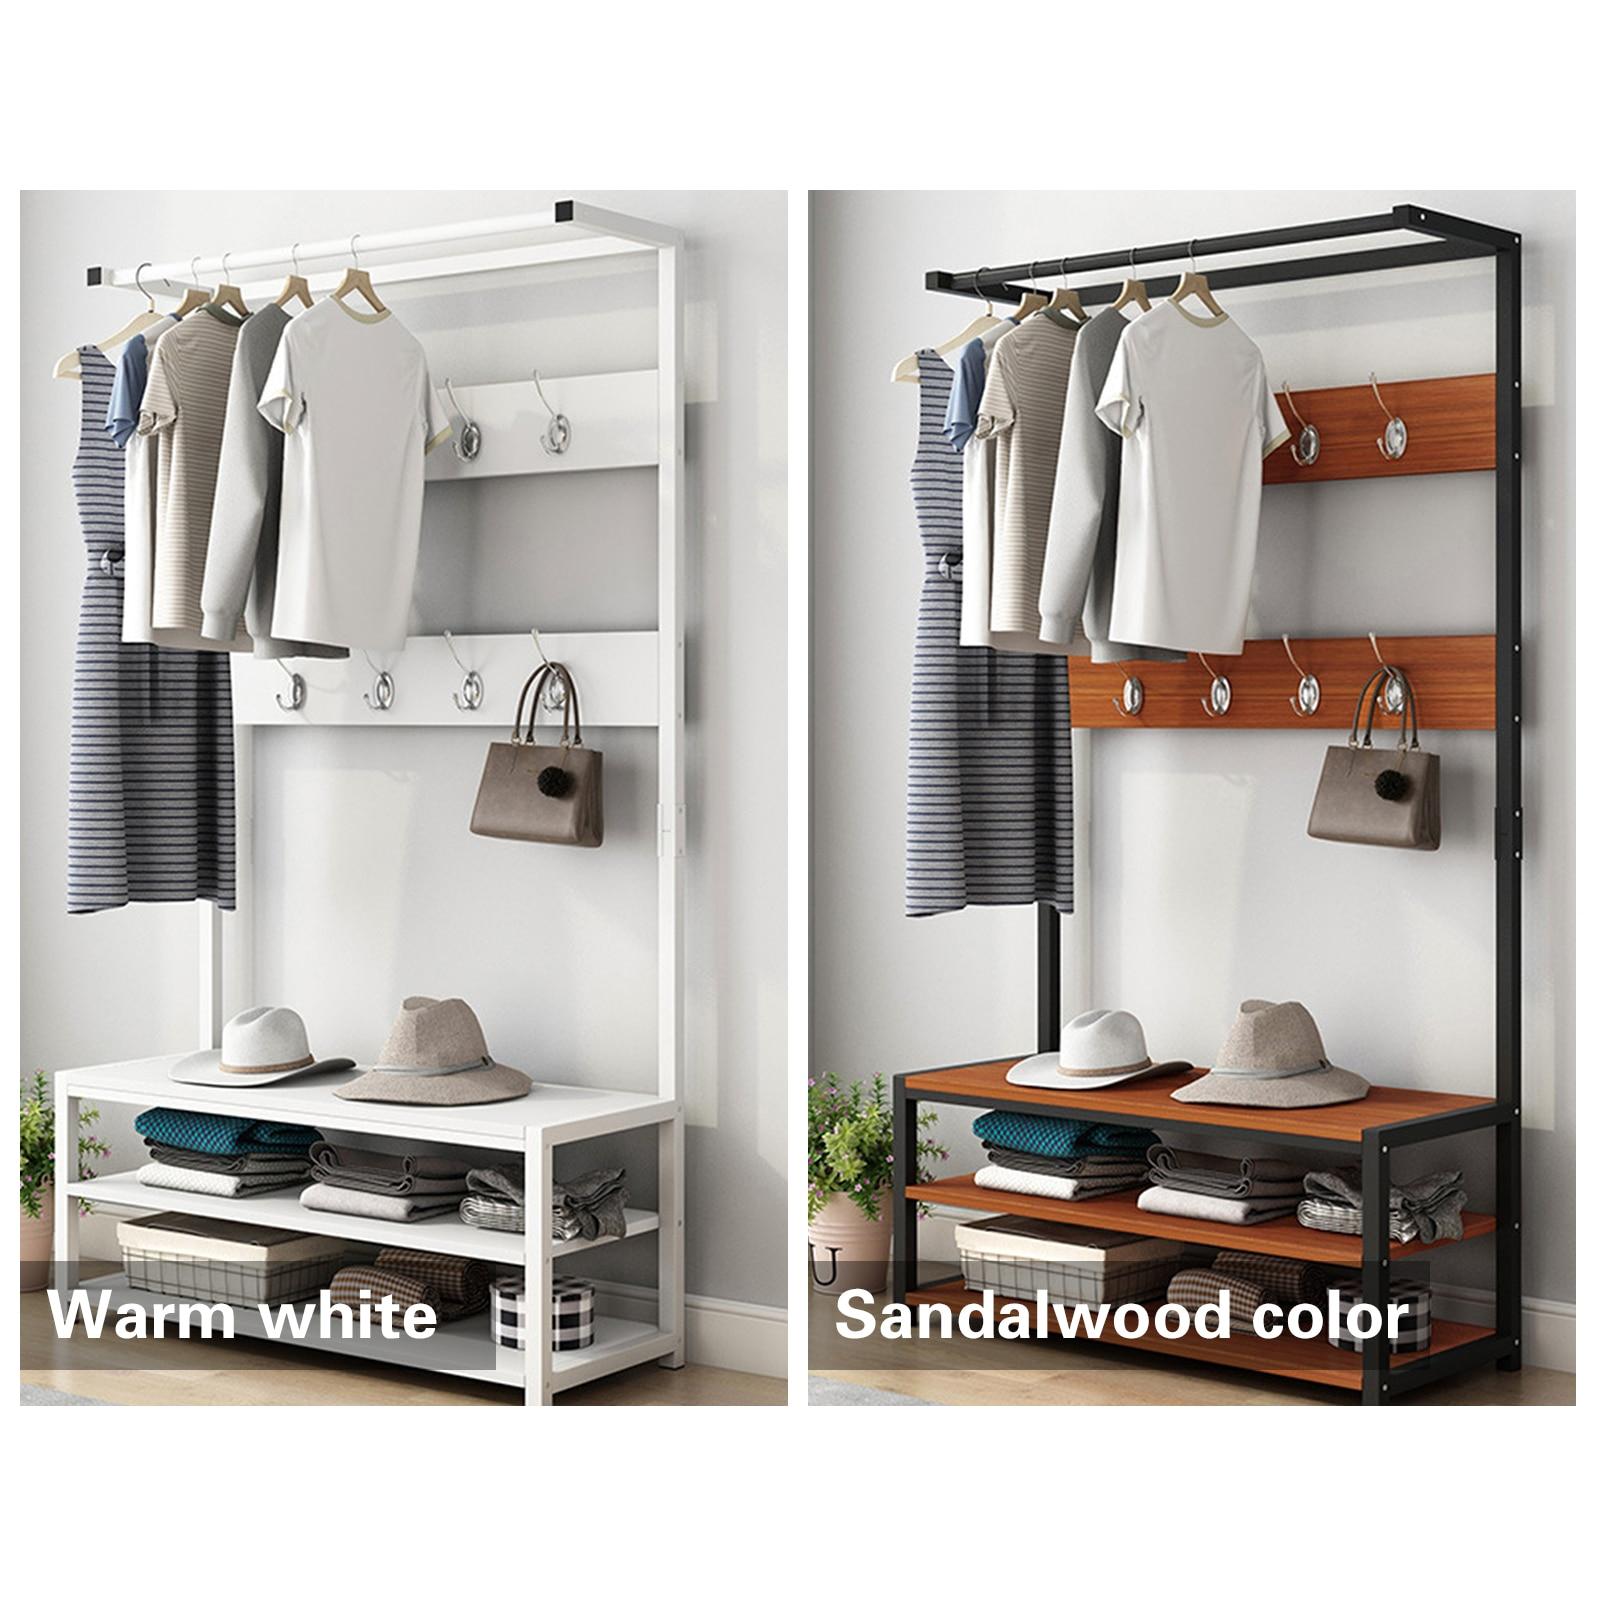 RU sellerMetal 8 Hooks Hat and Coat Stand Clothes Shoe Rack Hanger Hooks Shelf Black/white